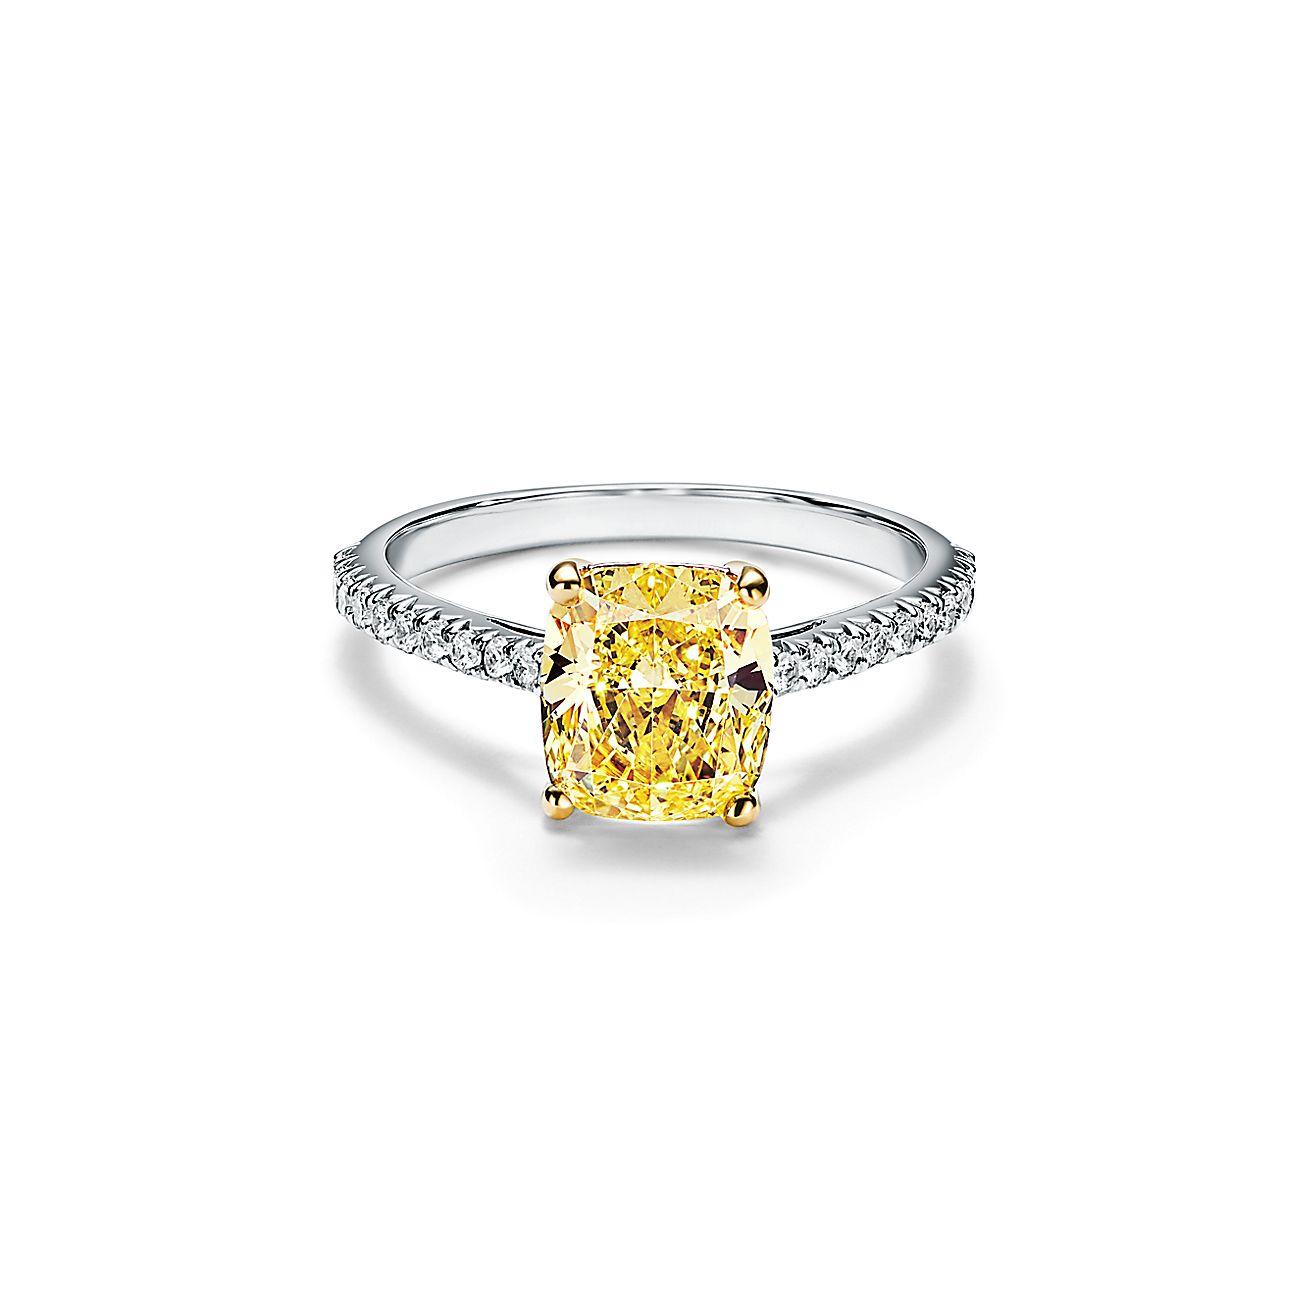 Tiffany Novo Yellow Diamond Engagement Ring With A Pave Diamond Platinum Band